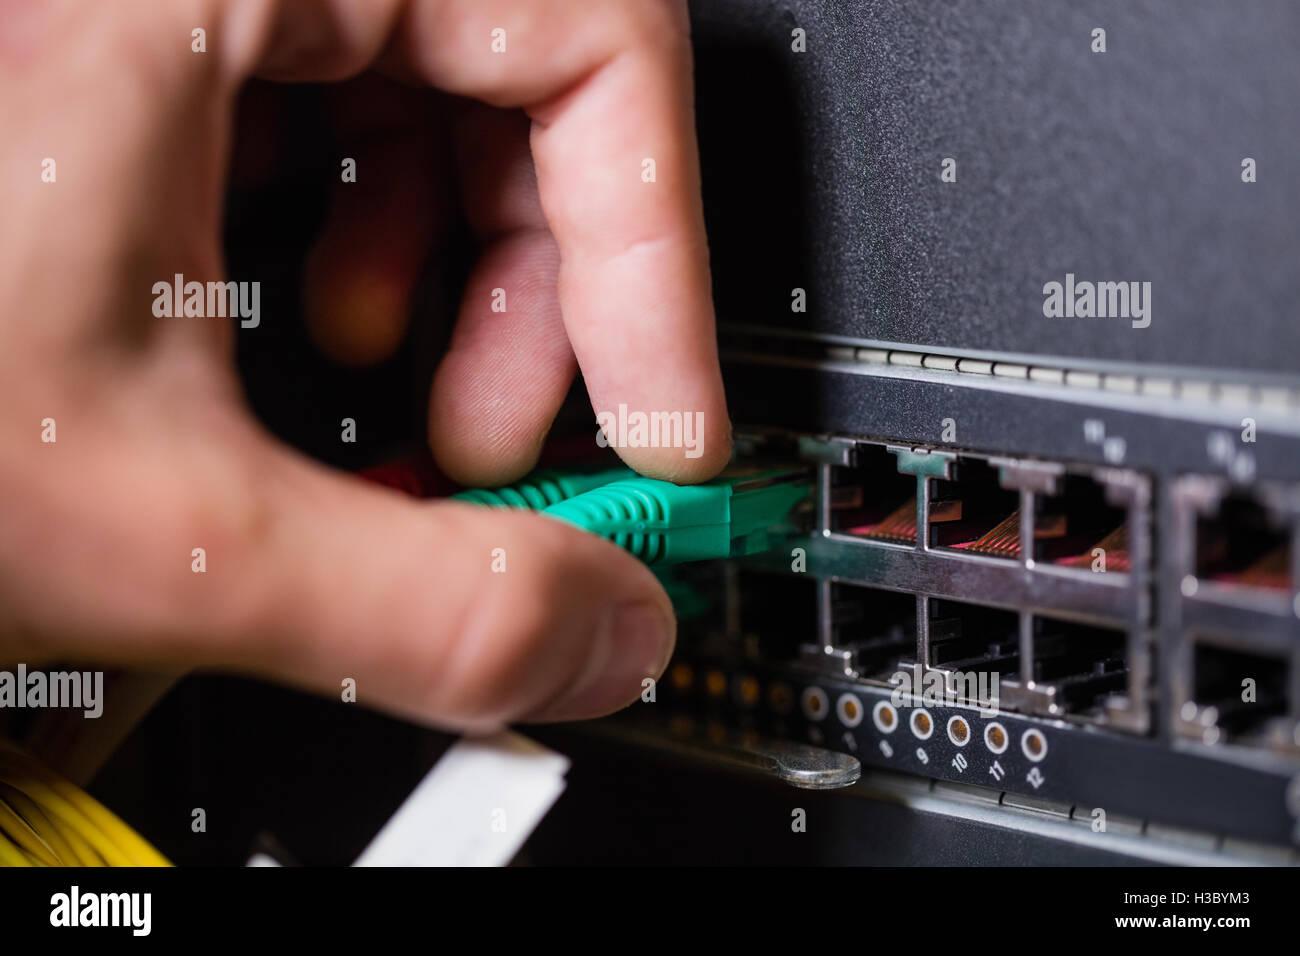 Ethernet Socket Stock Photos & Ethernet Socket Stock Images - Alamy